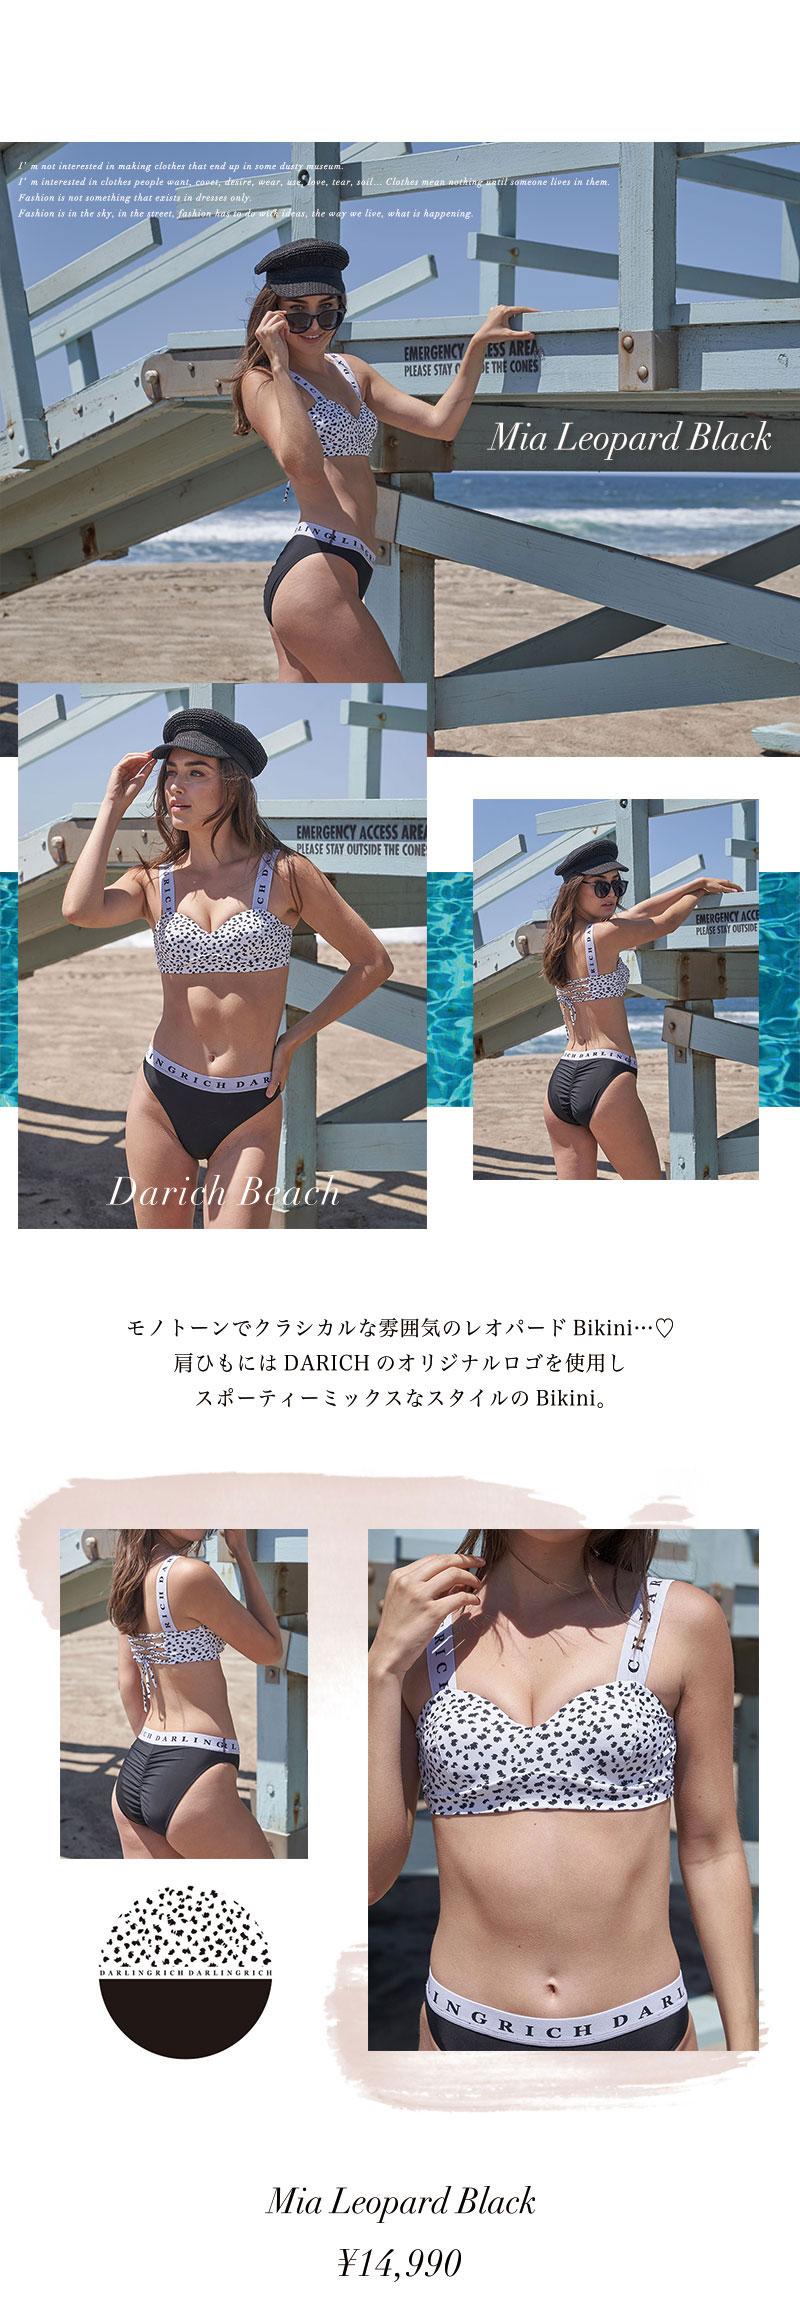 19SS SWIMWEAR COLLECTION特集4